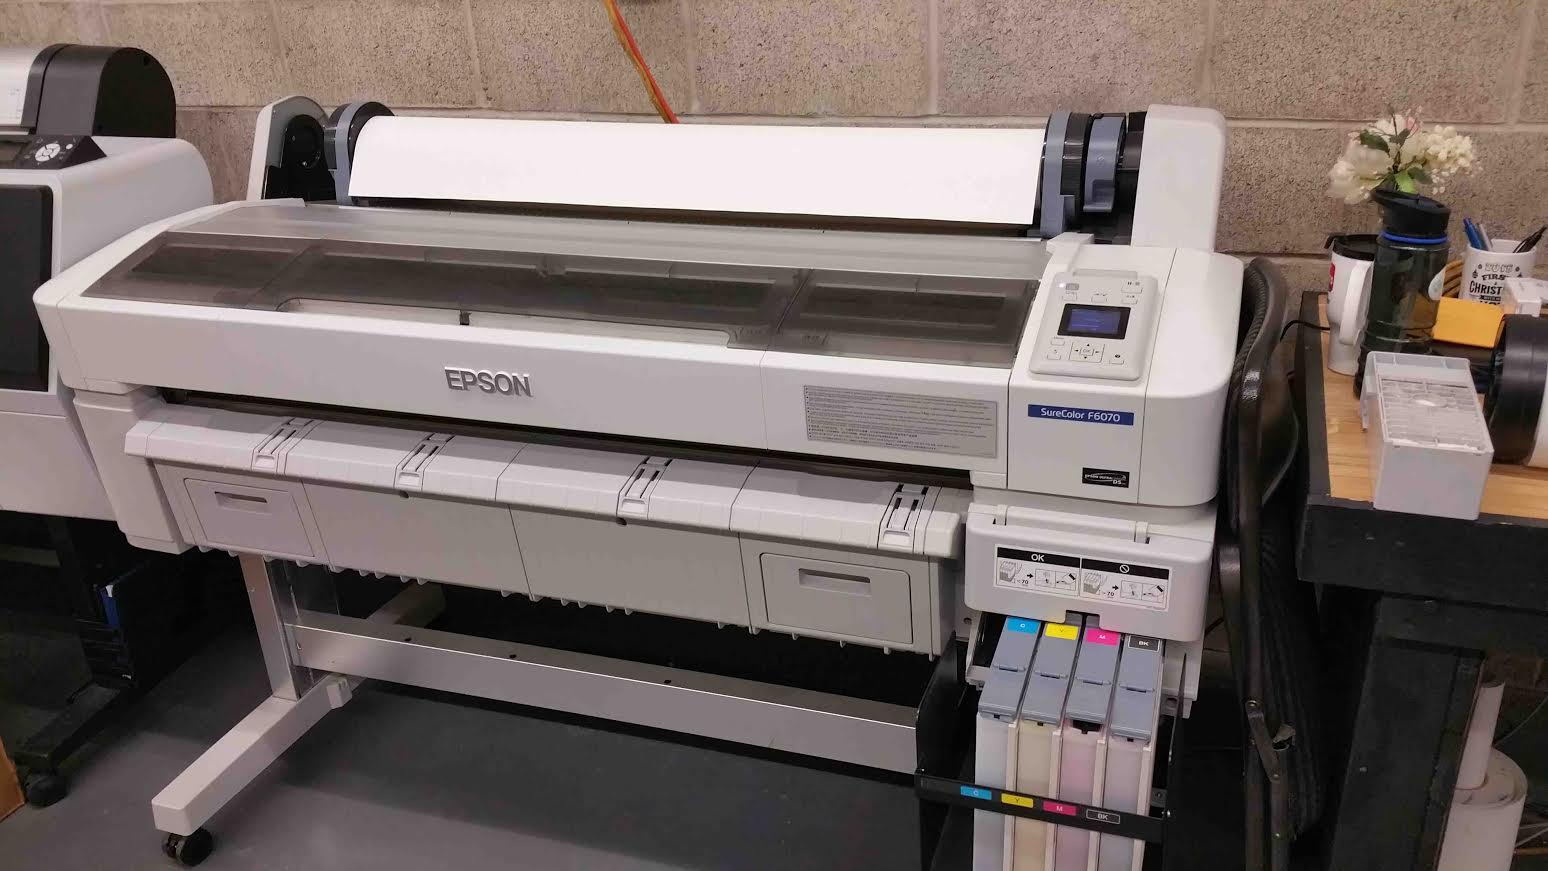 Image result for sublimation printer